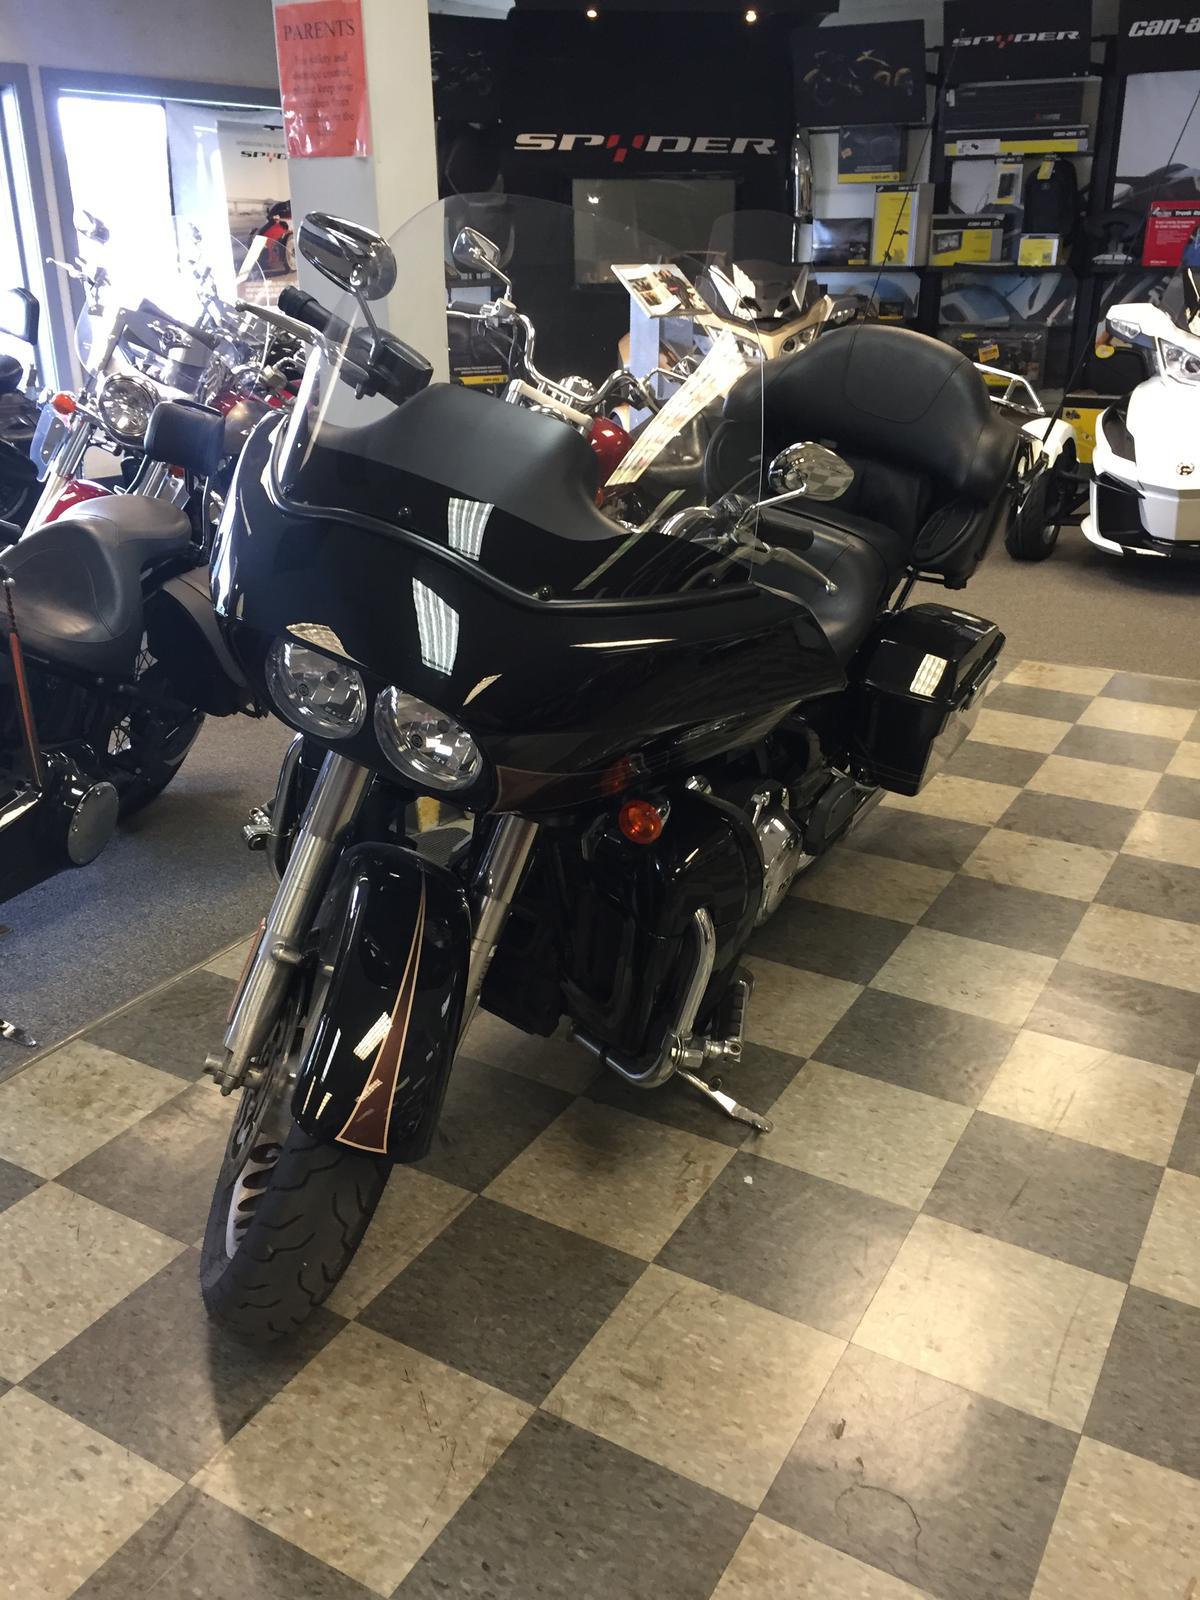 2013 Harley-Davidson® Road Glide Ultra